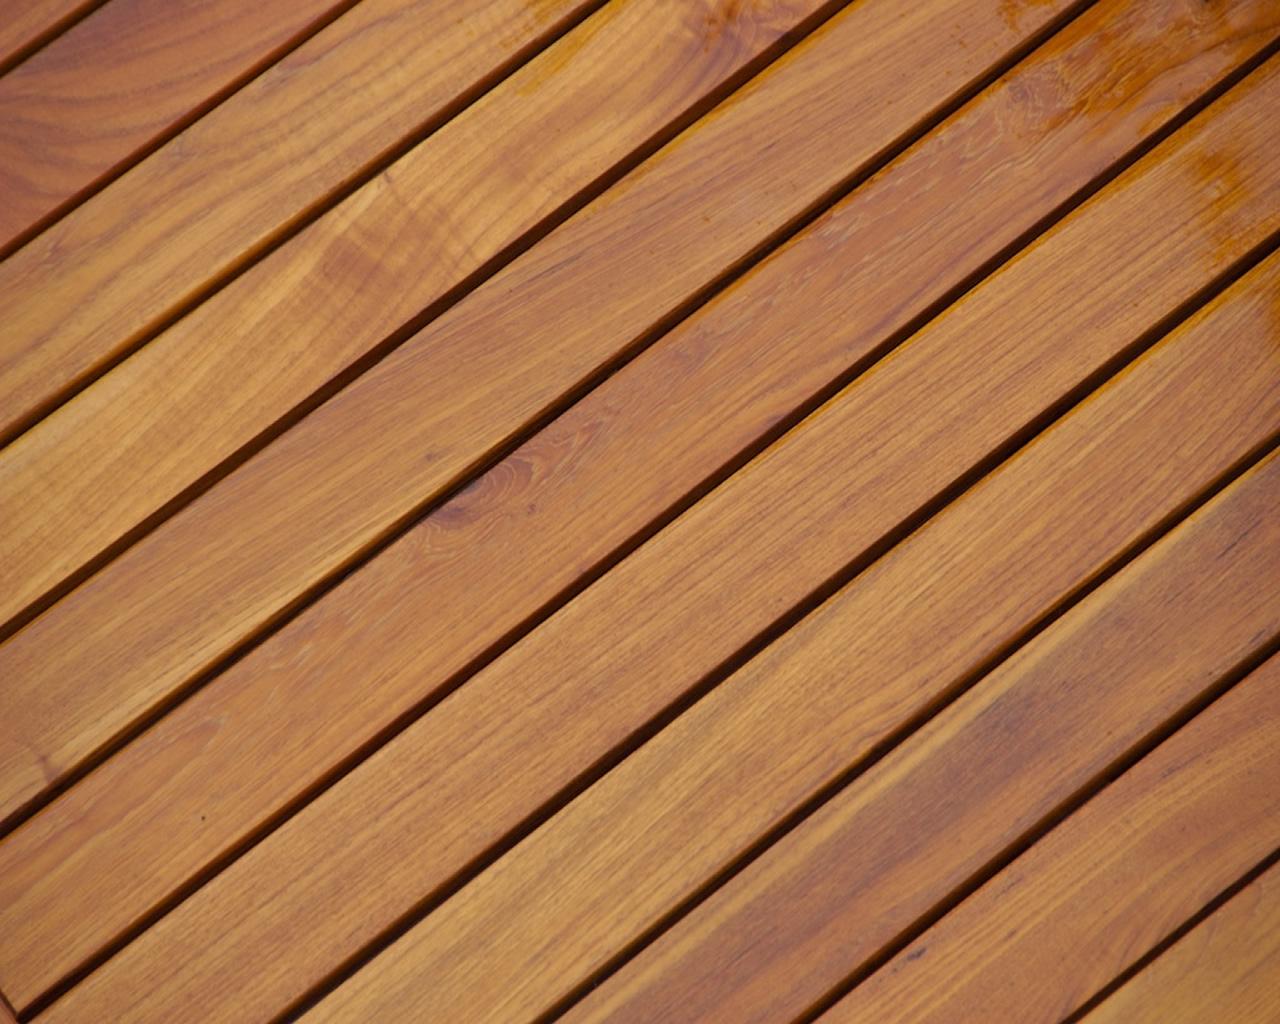 Tarima de madera o tarima sint tica cu l es mejor for Madera para exterior